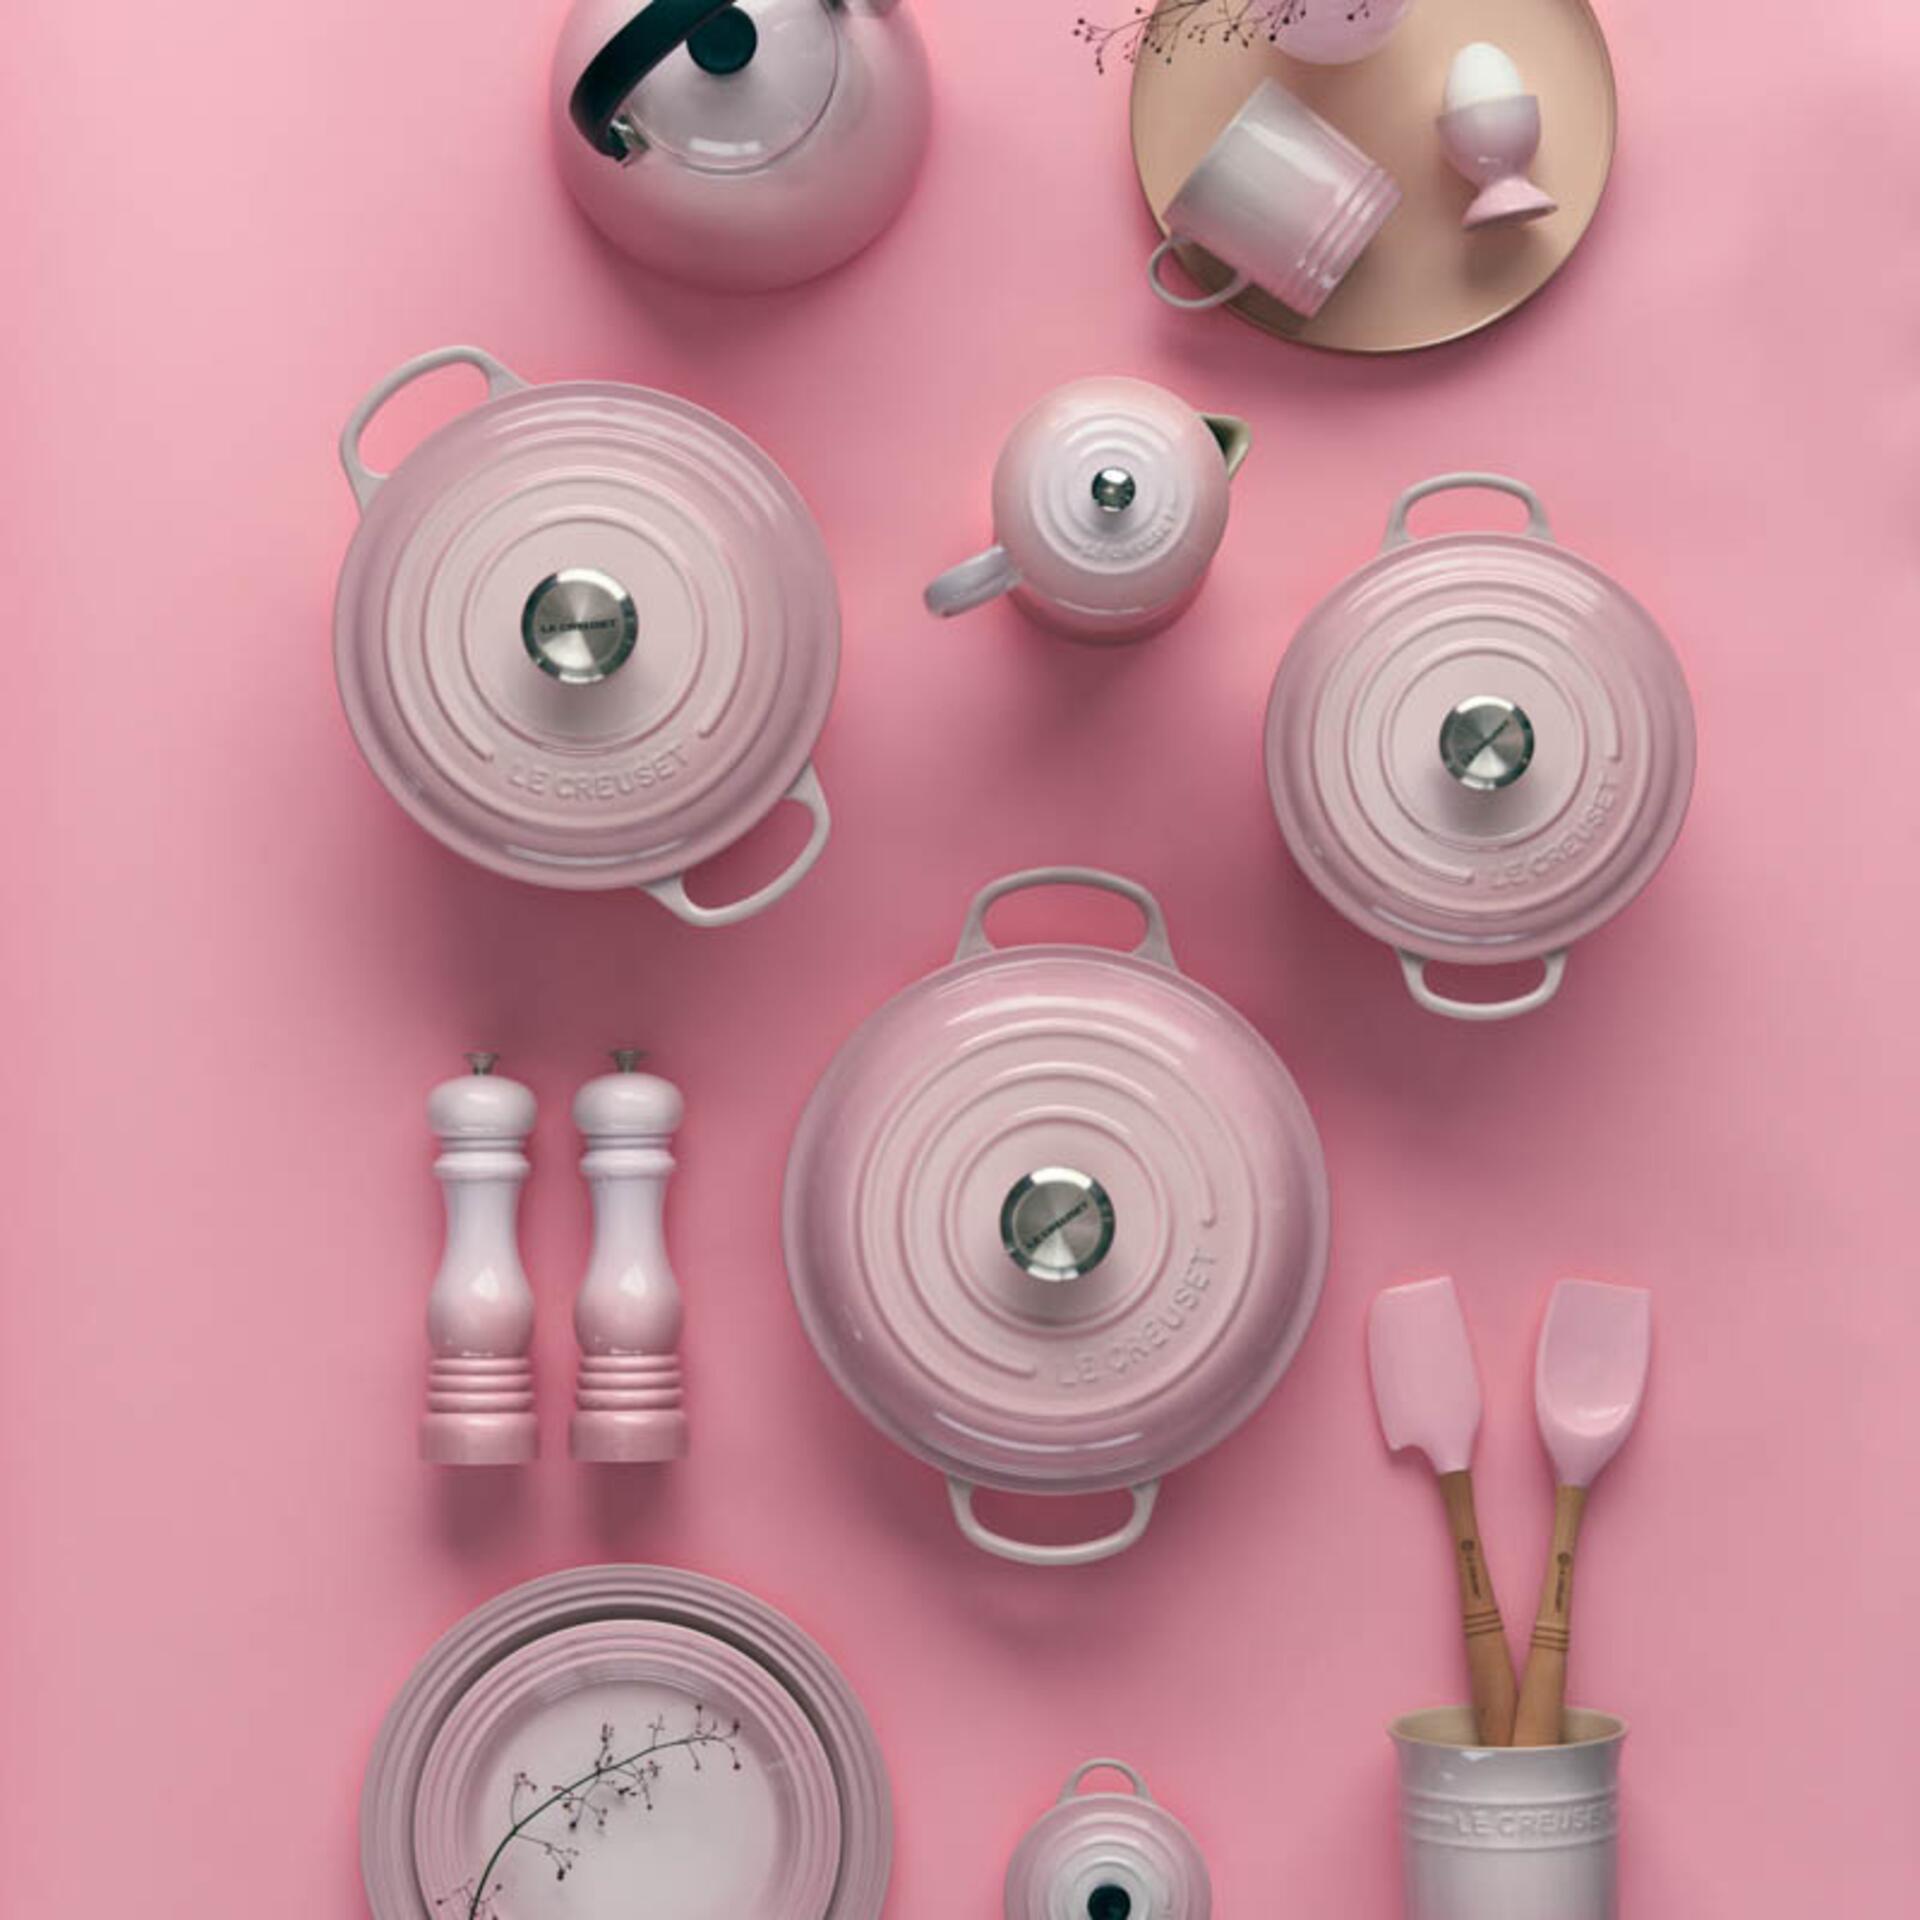 Le Creuset Brat-/Servierpfanne 23 cm Shell Pink